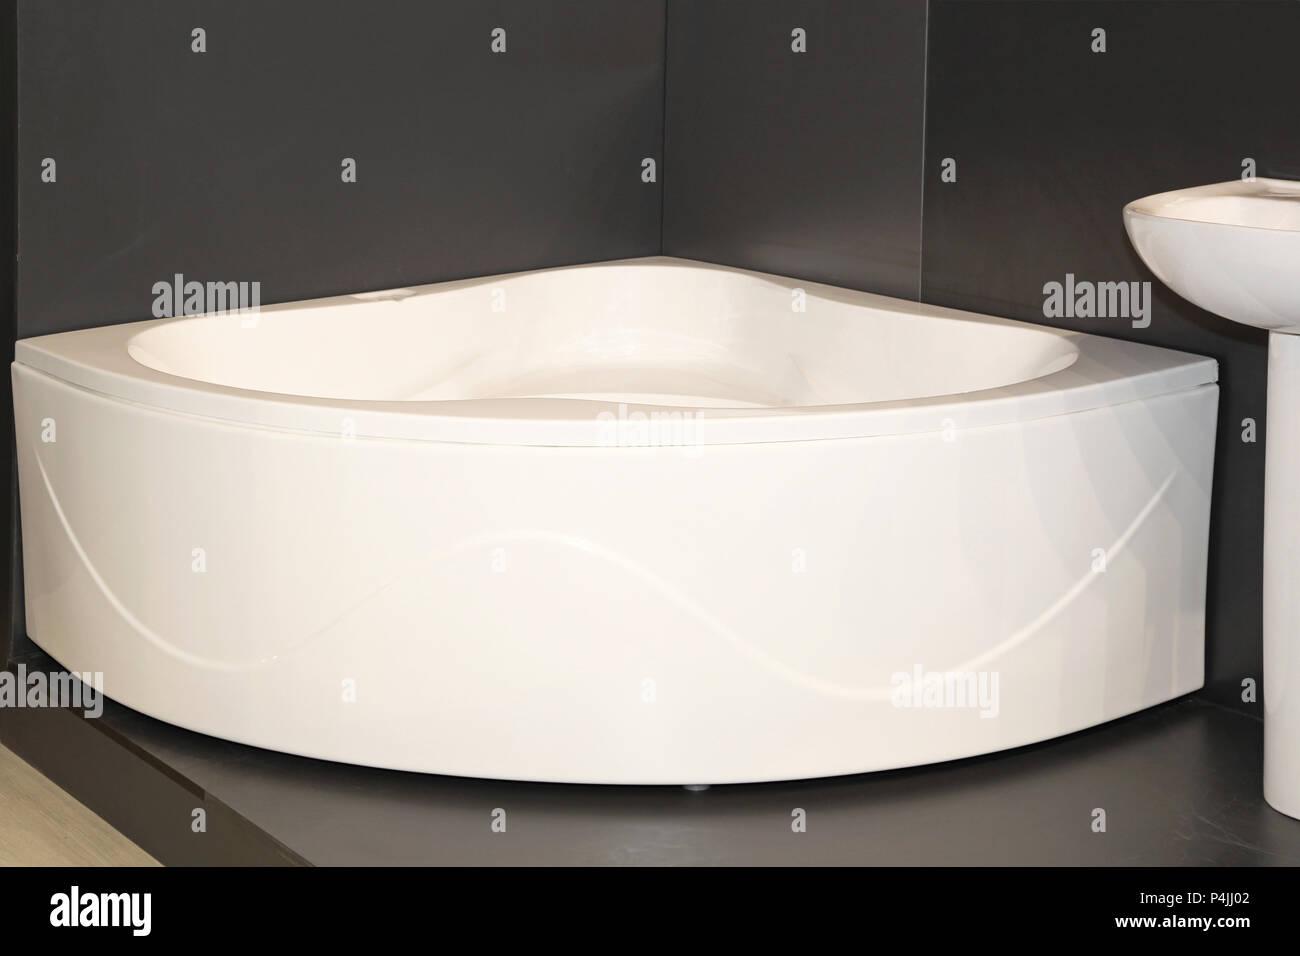 Vasca Da Bagno Angolare Ceramica : Vasca da bagno angolare immagini vasca da bagno angolare fotos